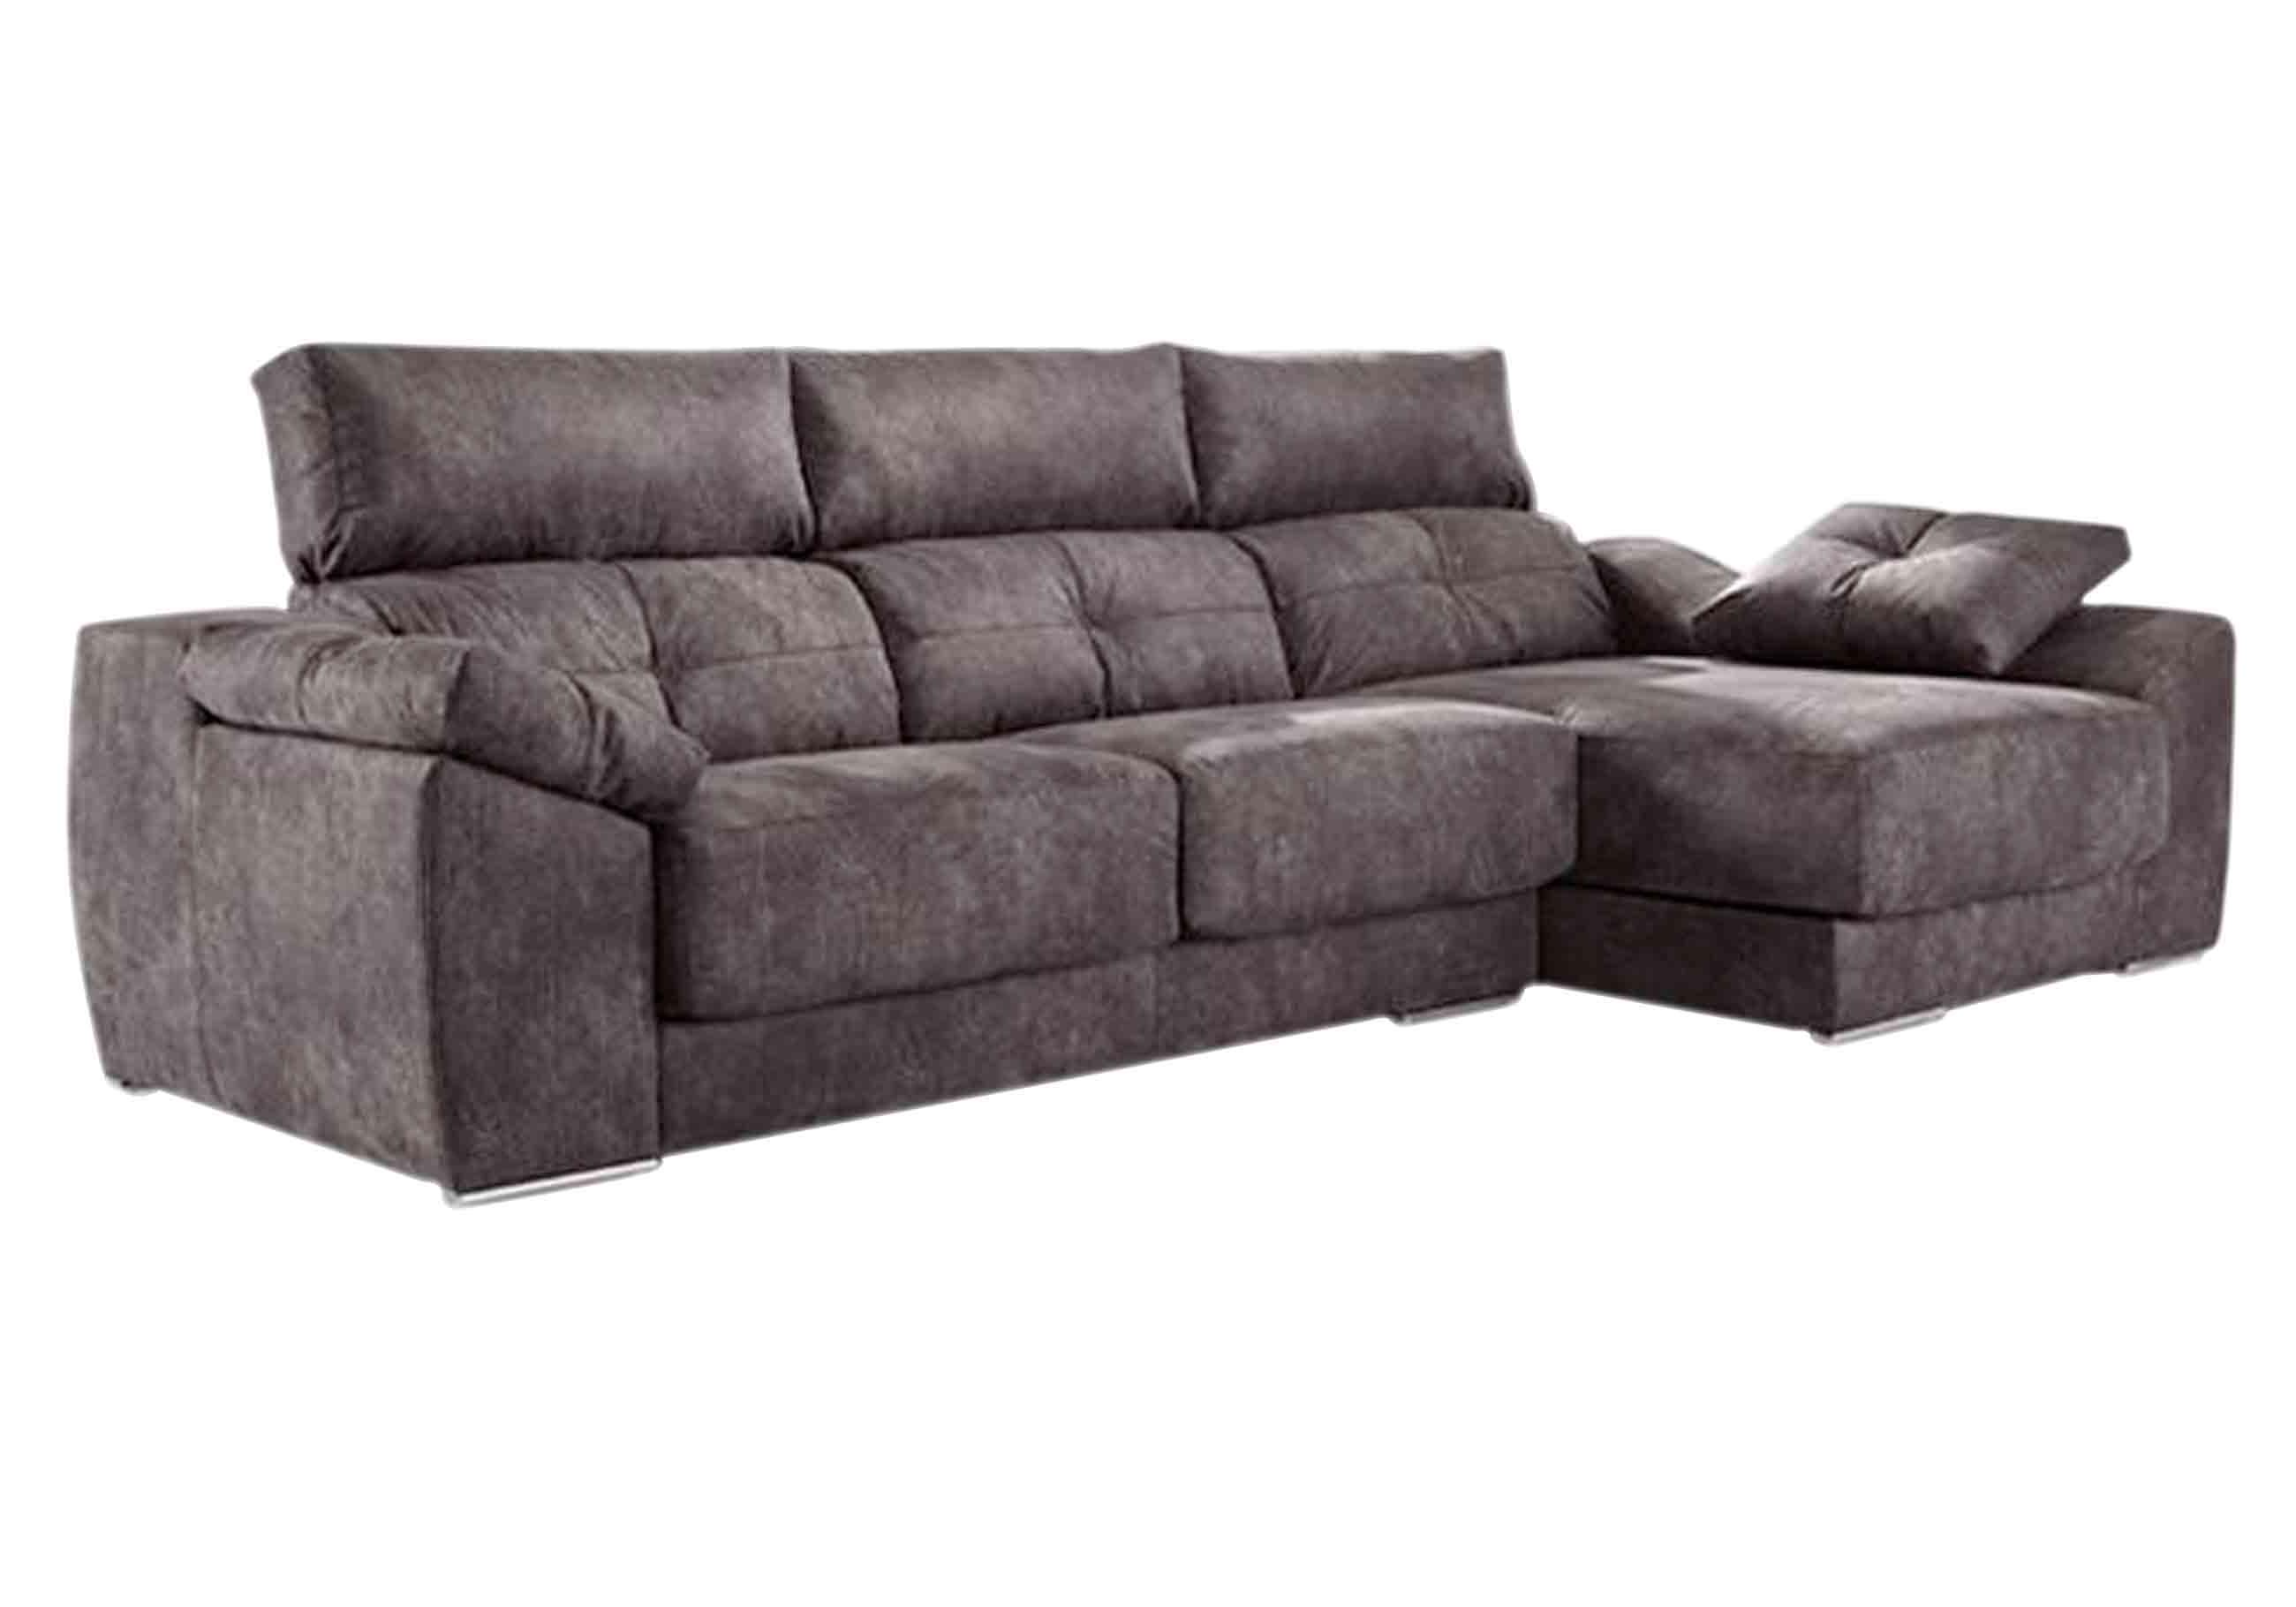 Sofa Deslizante E9dx Prar sofà S Baratos Sevilla Con Chaiselongue Muebles Sà Rria